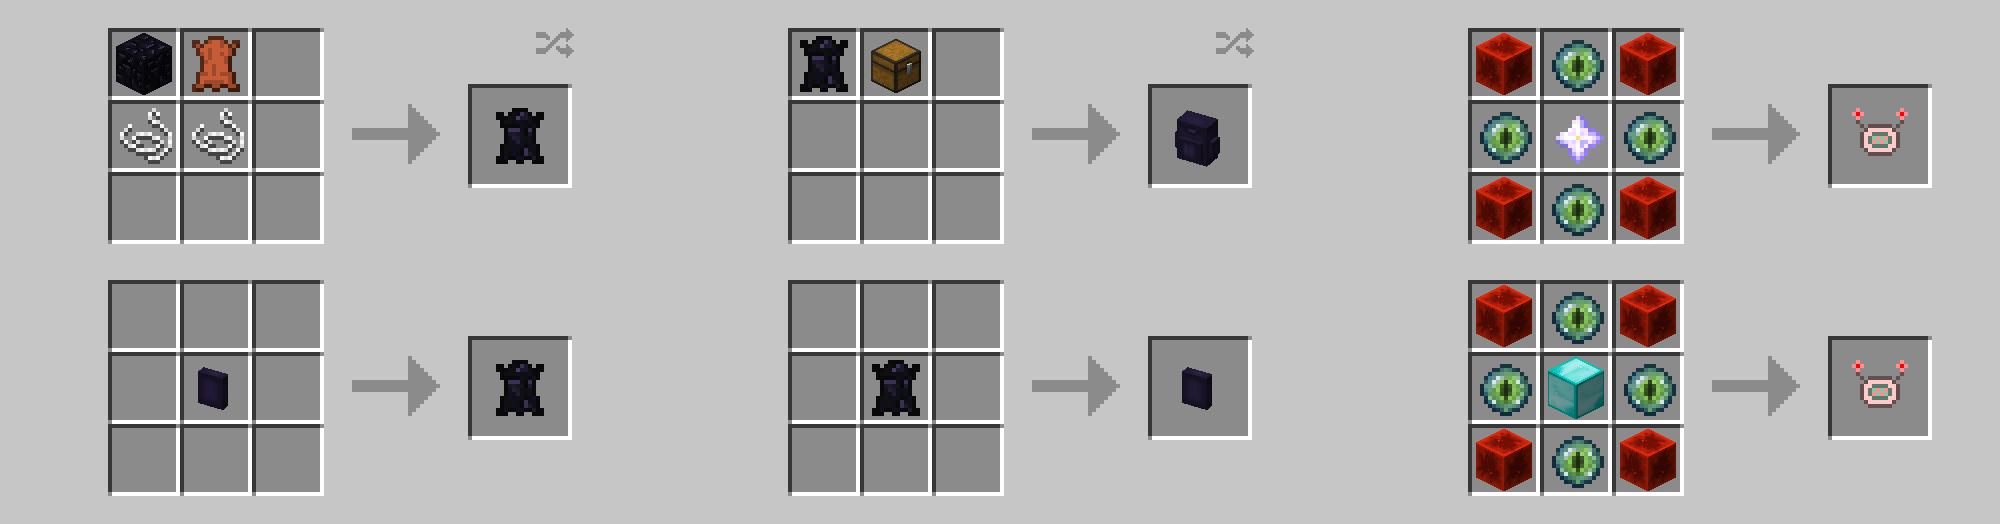 Expandable-Backpacks-Mod-3